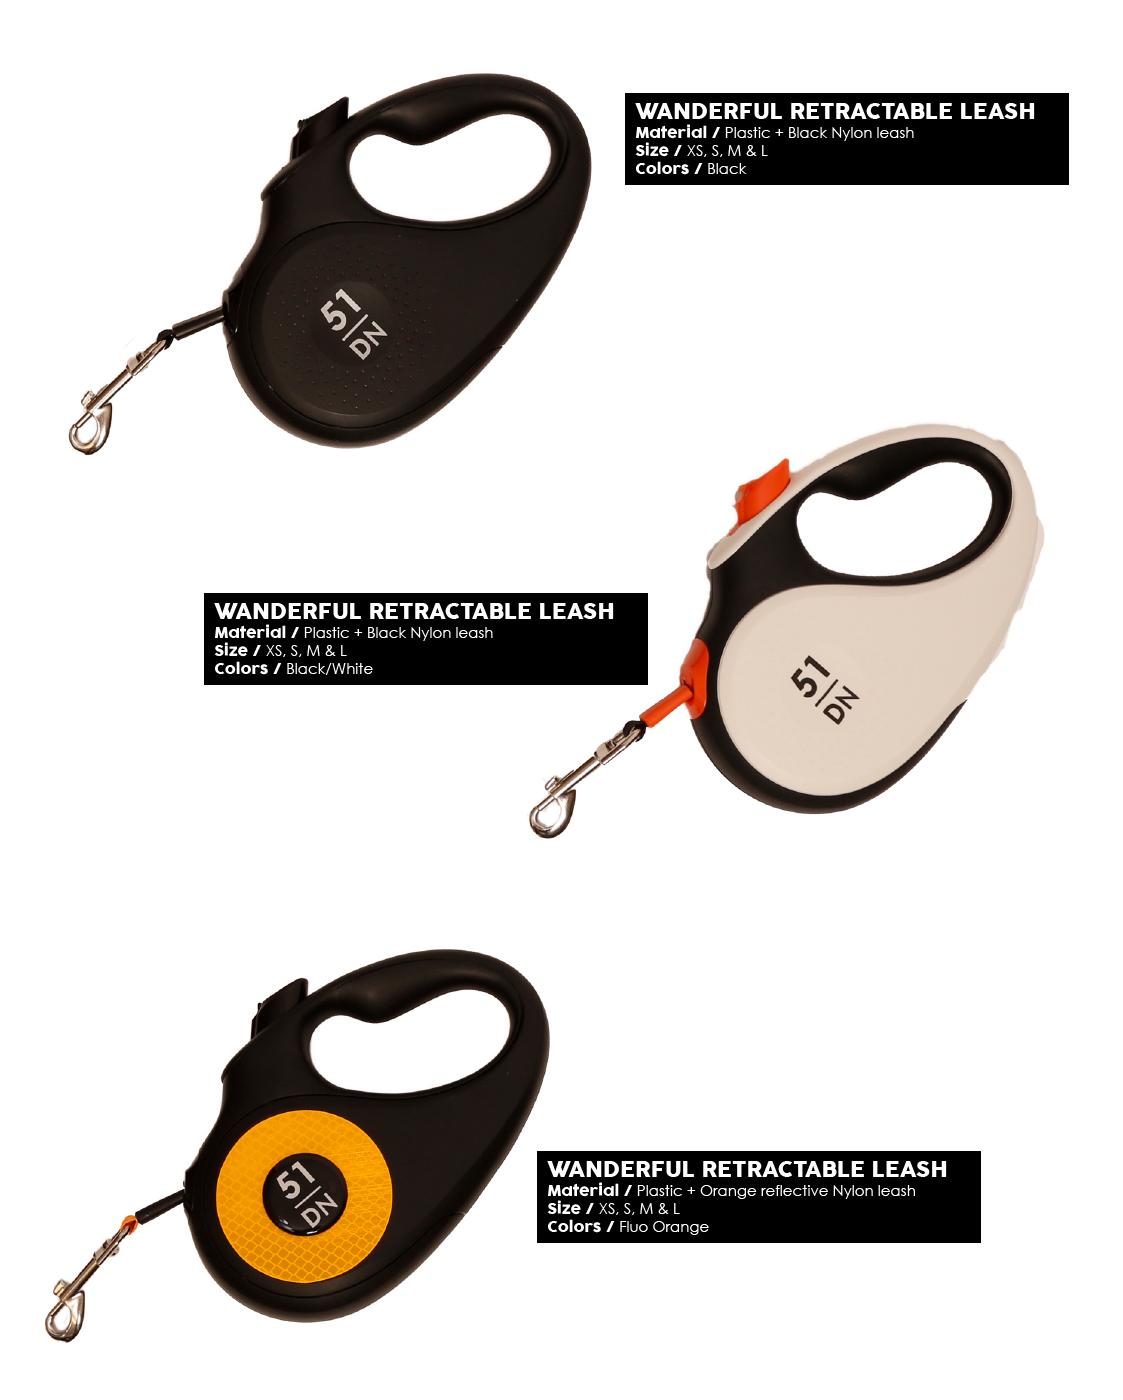 51DN - Walk - Wanderful Retractable Leash - Products1